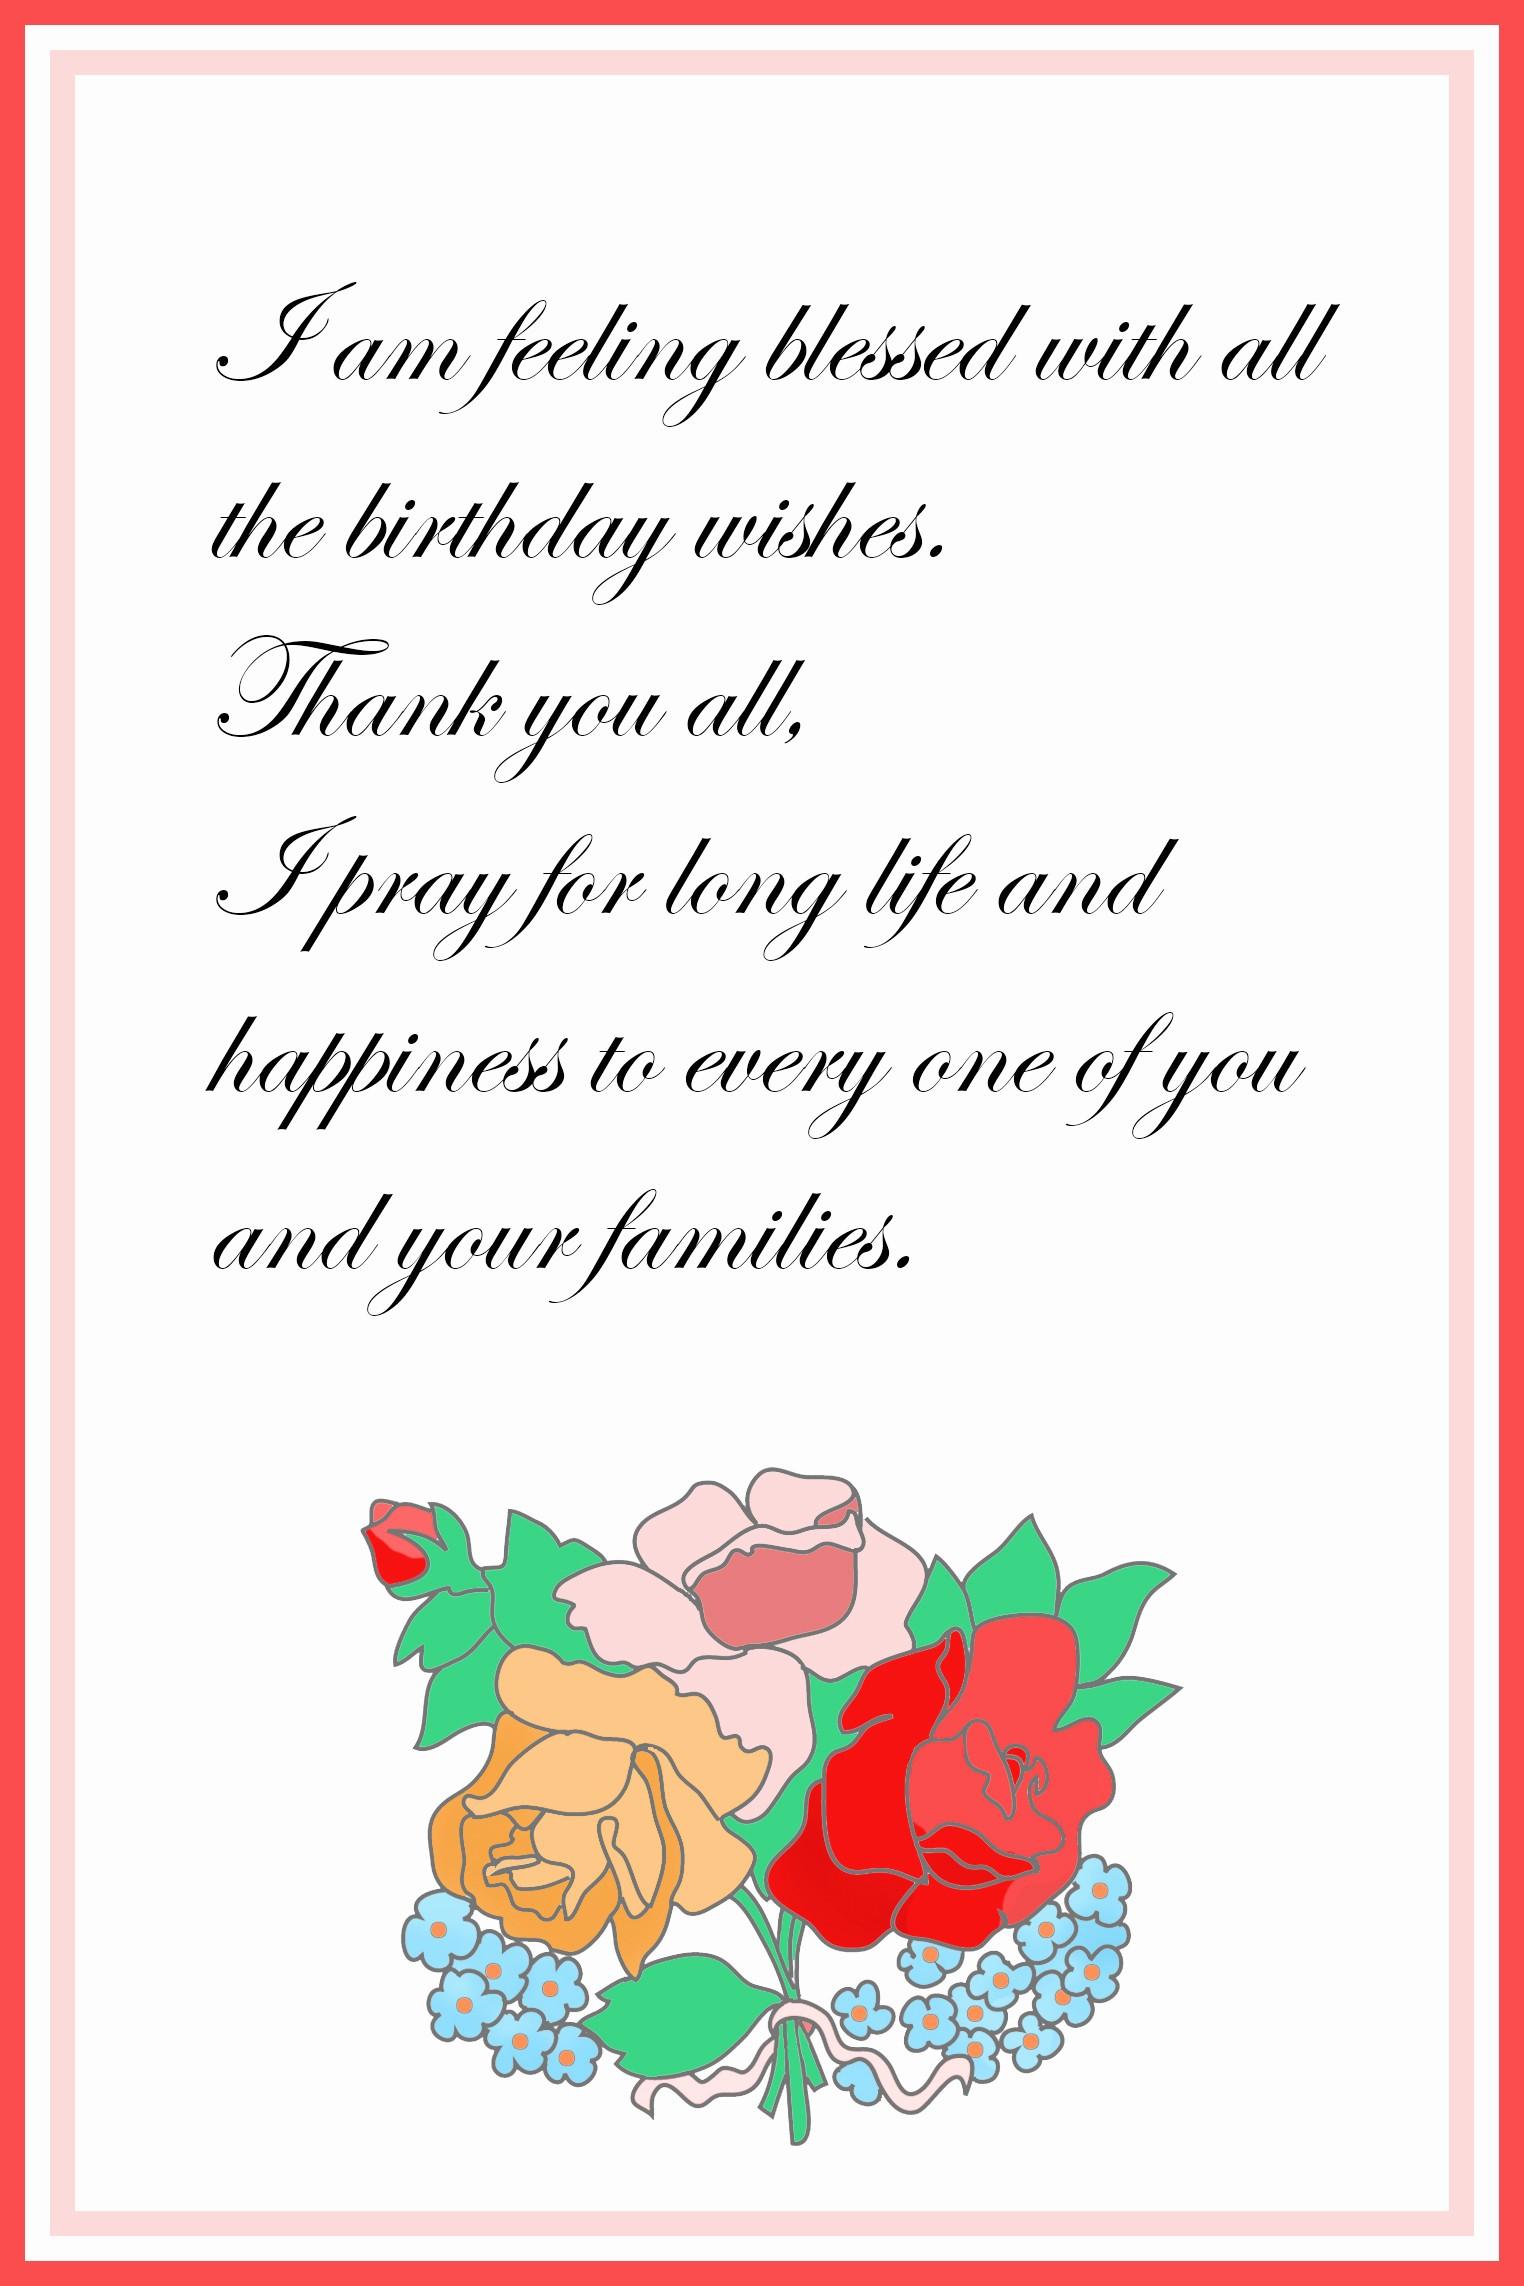 Thank You Card Template Free Elegant Printable Thank You Cards – Free Printable Greeting Cards